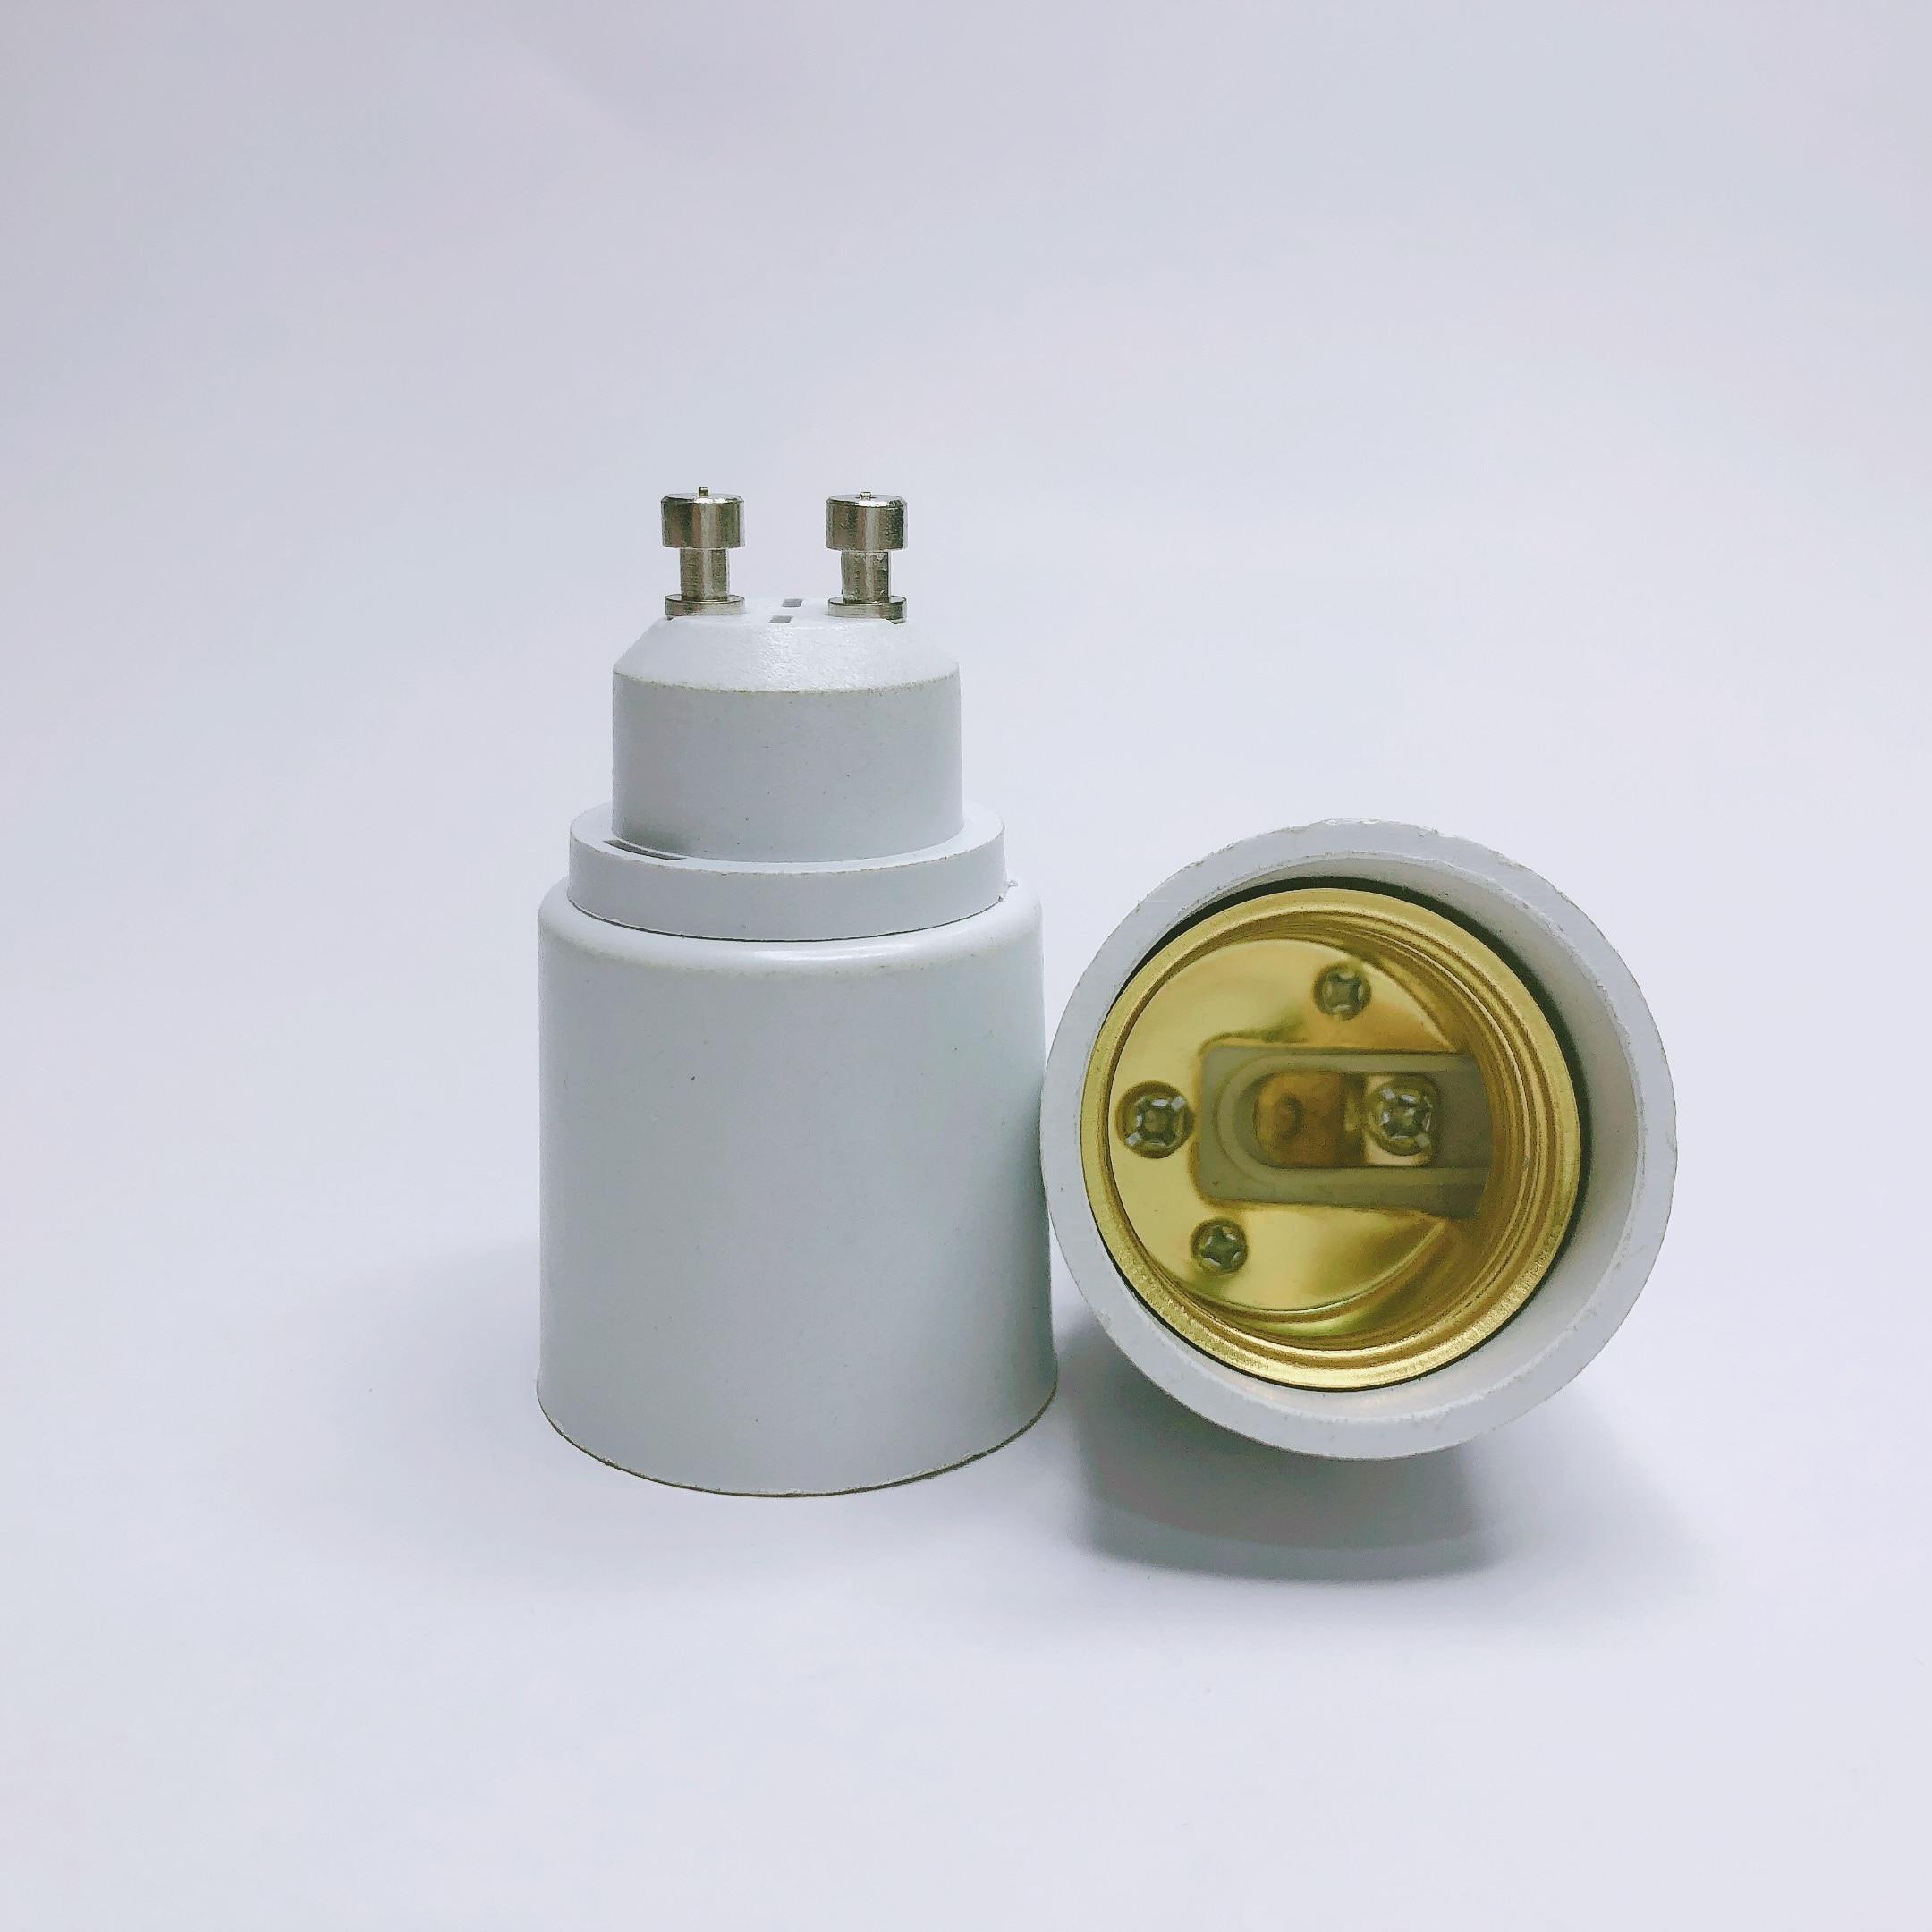 Led Lamp Base Converter GU10 to E27 Screw Light Bulb Holder Adapter Socket Plug Extender PBT Plastic Safty Fast Ship(China)